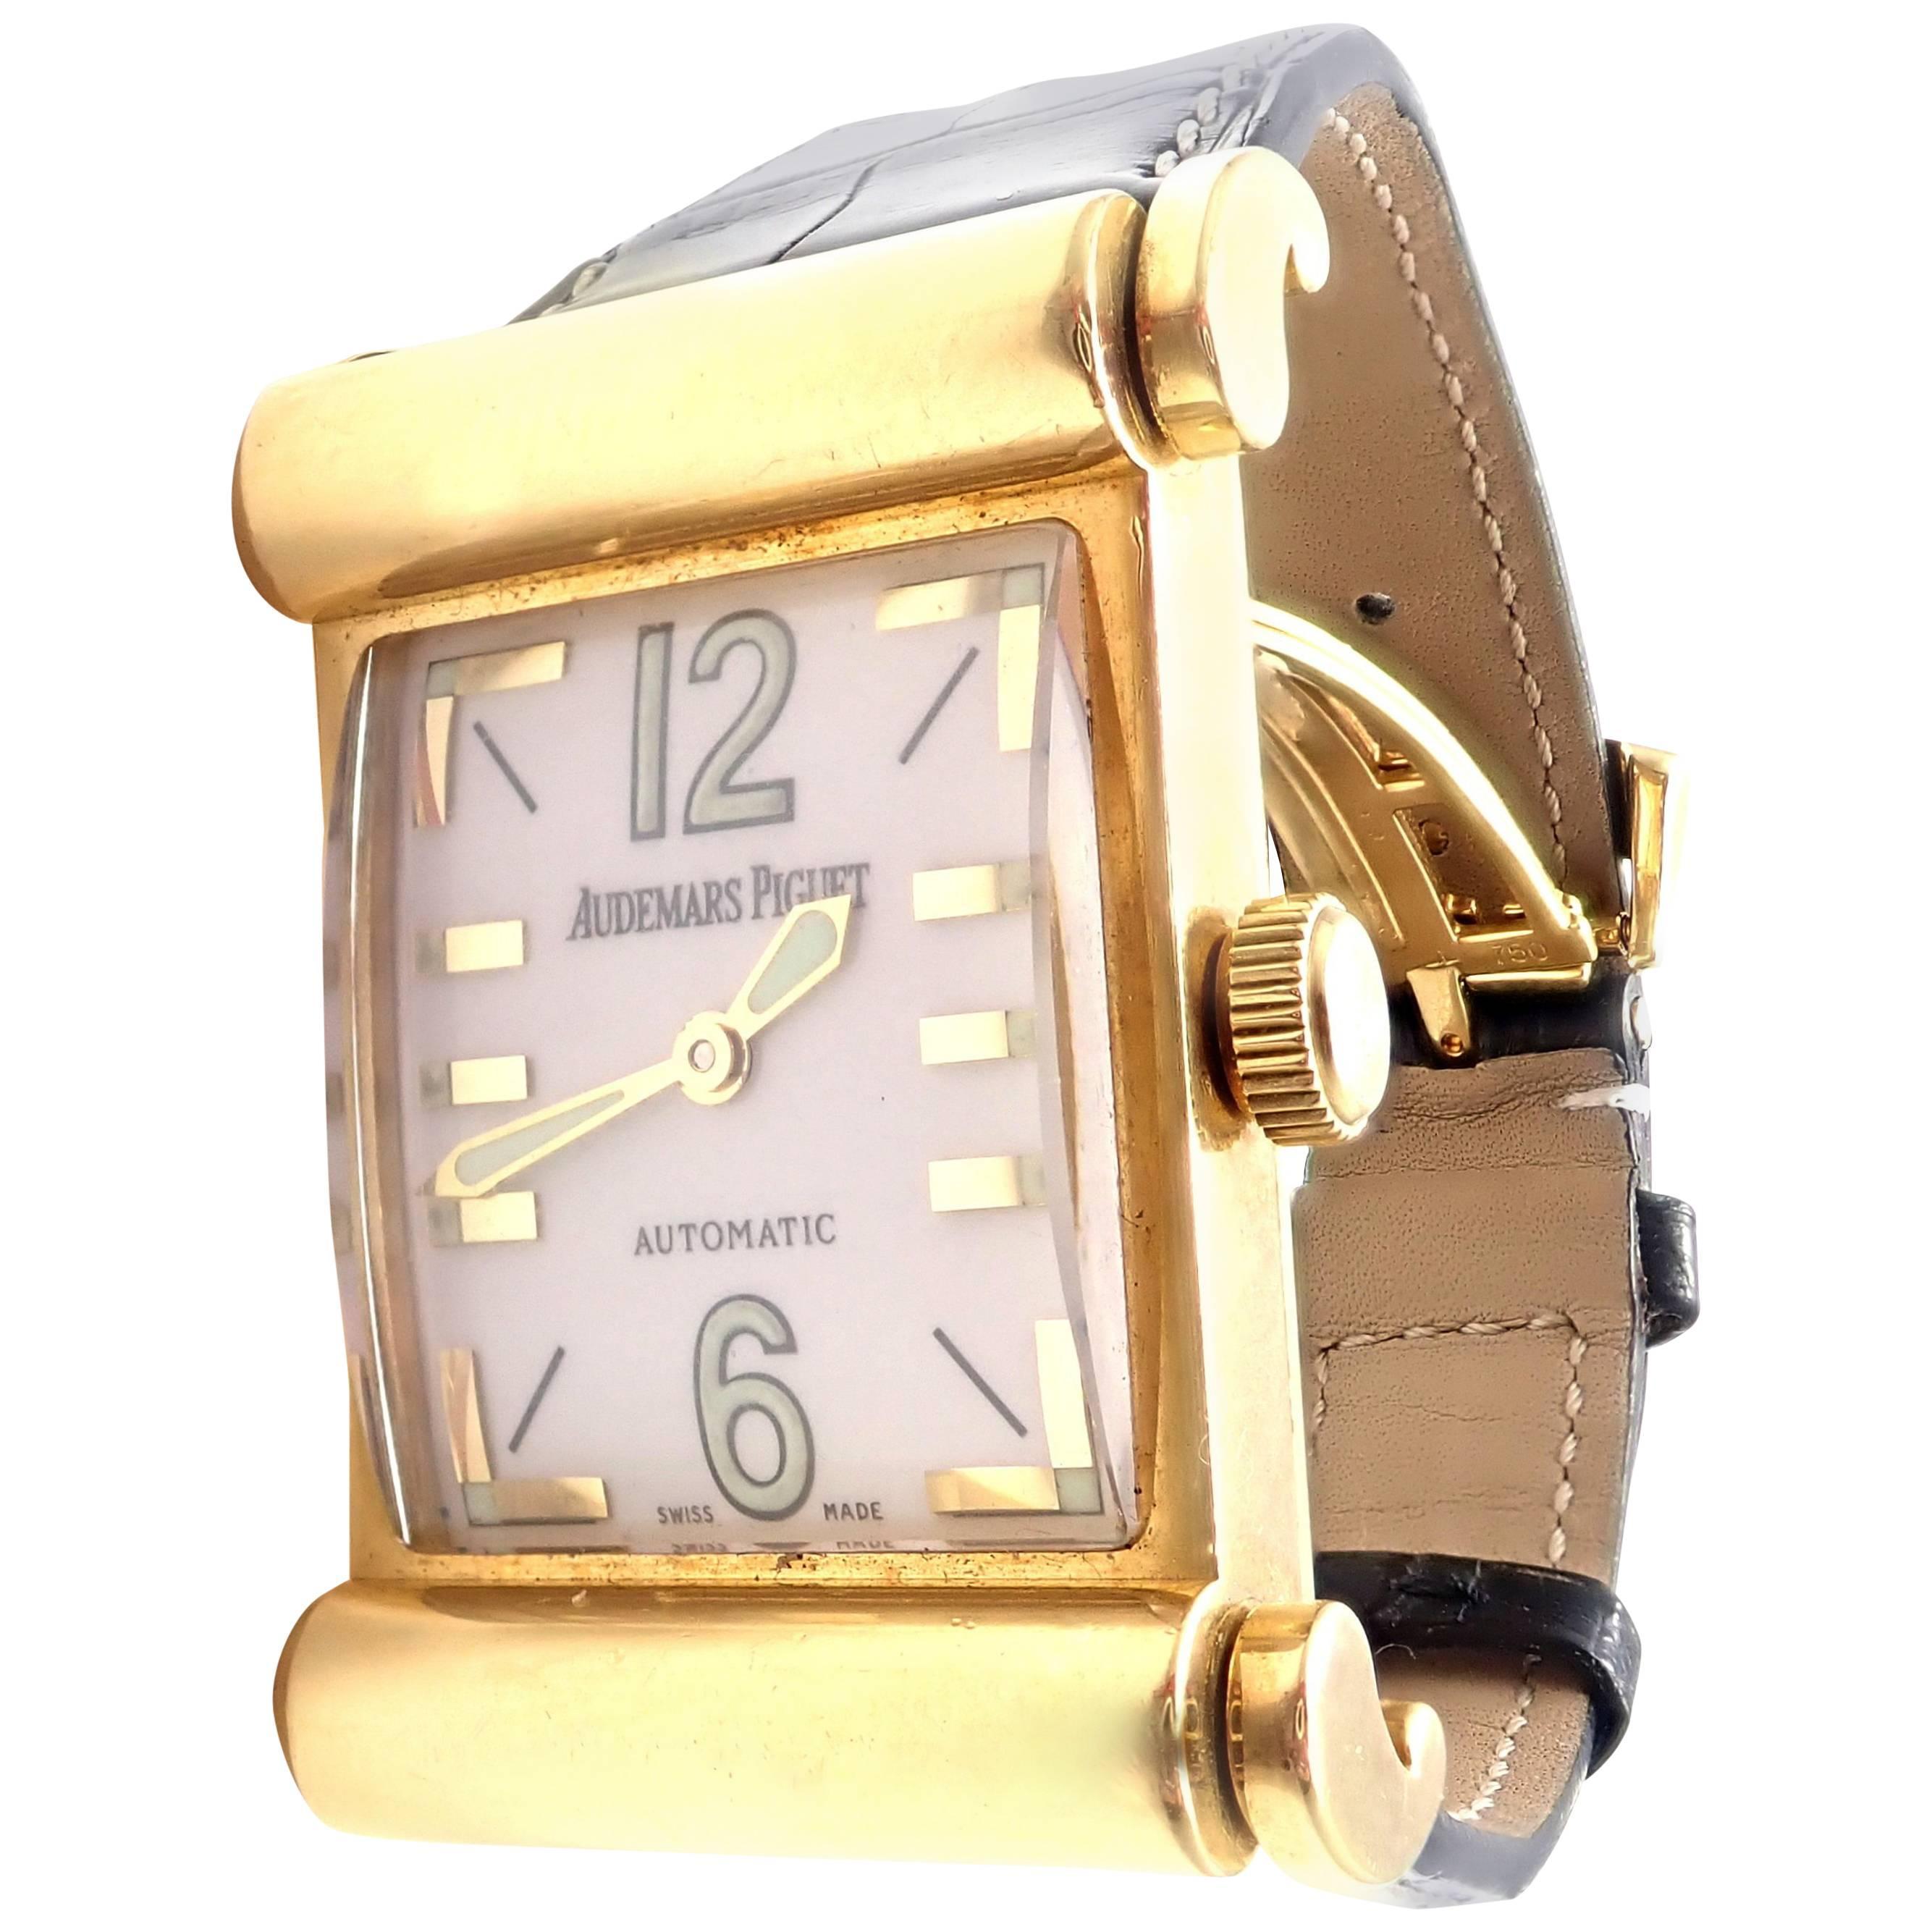 Audemars Piguet Yellow Gold Canape Automatic Wristwatch